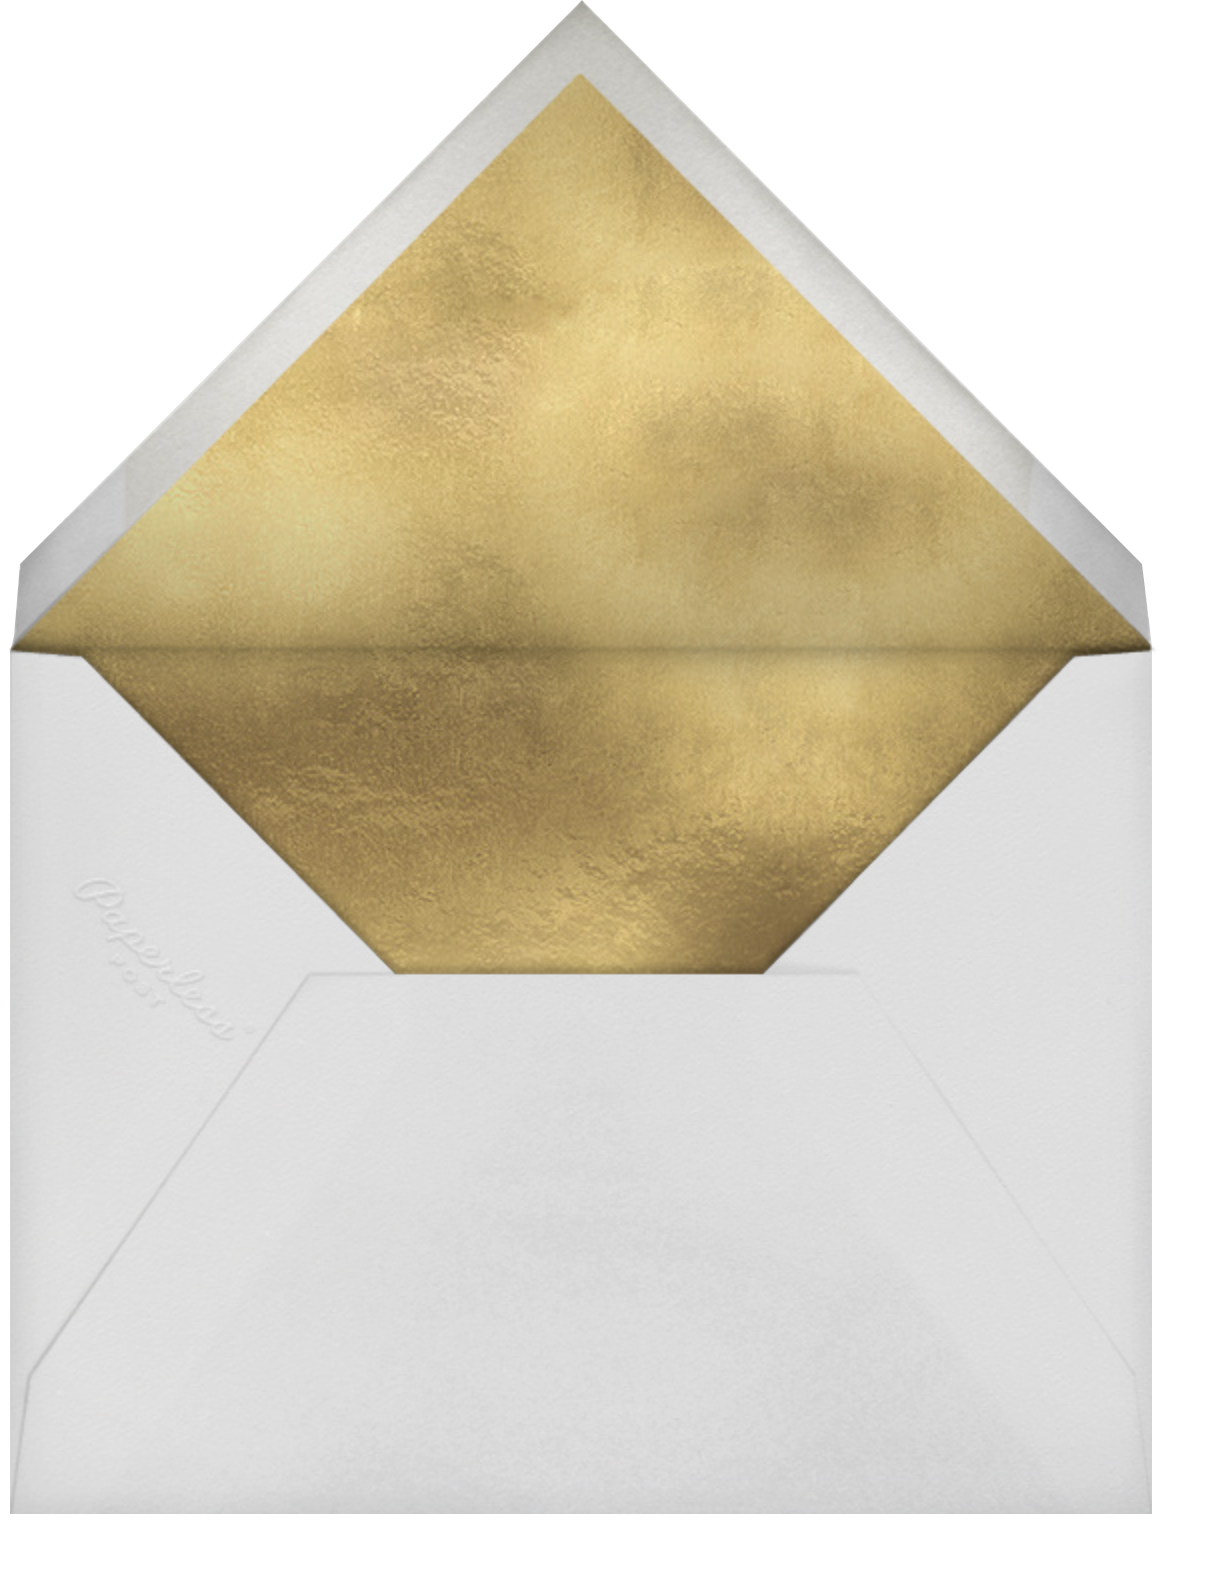 Raw Edge - New Date - Paperless Post - Envelope